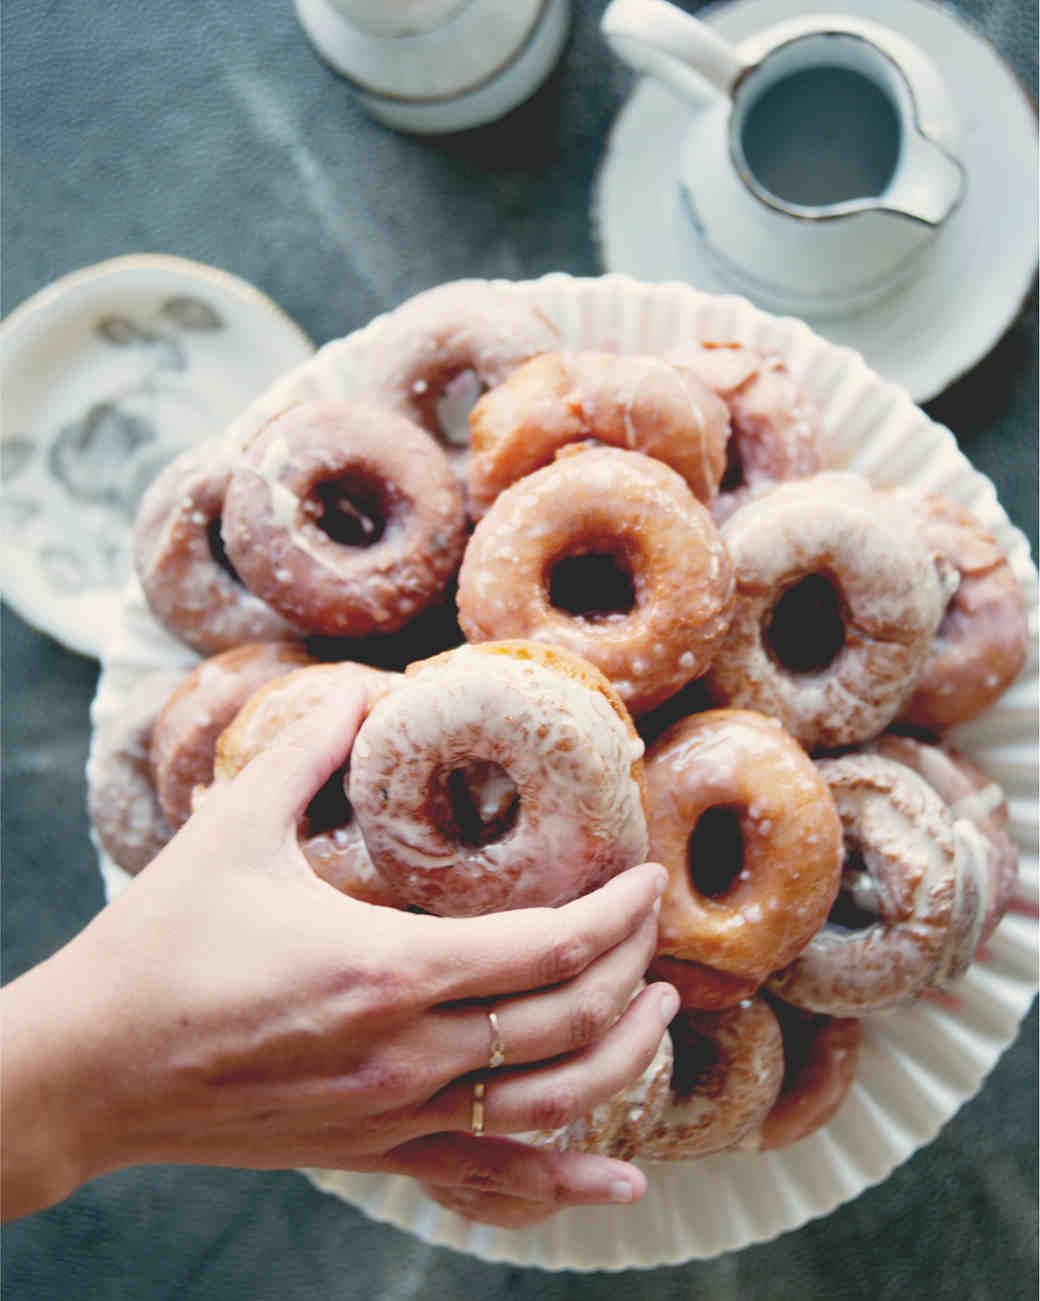 claire-thomas-bridal-shower-tea-grab-donuts-0814.jpg